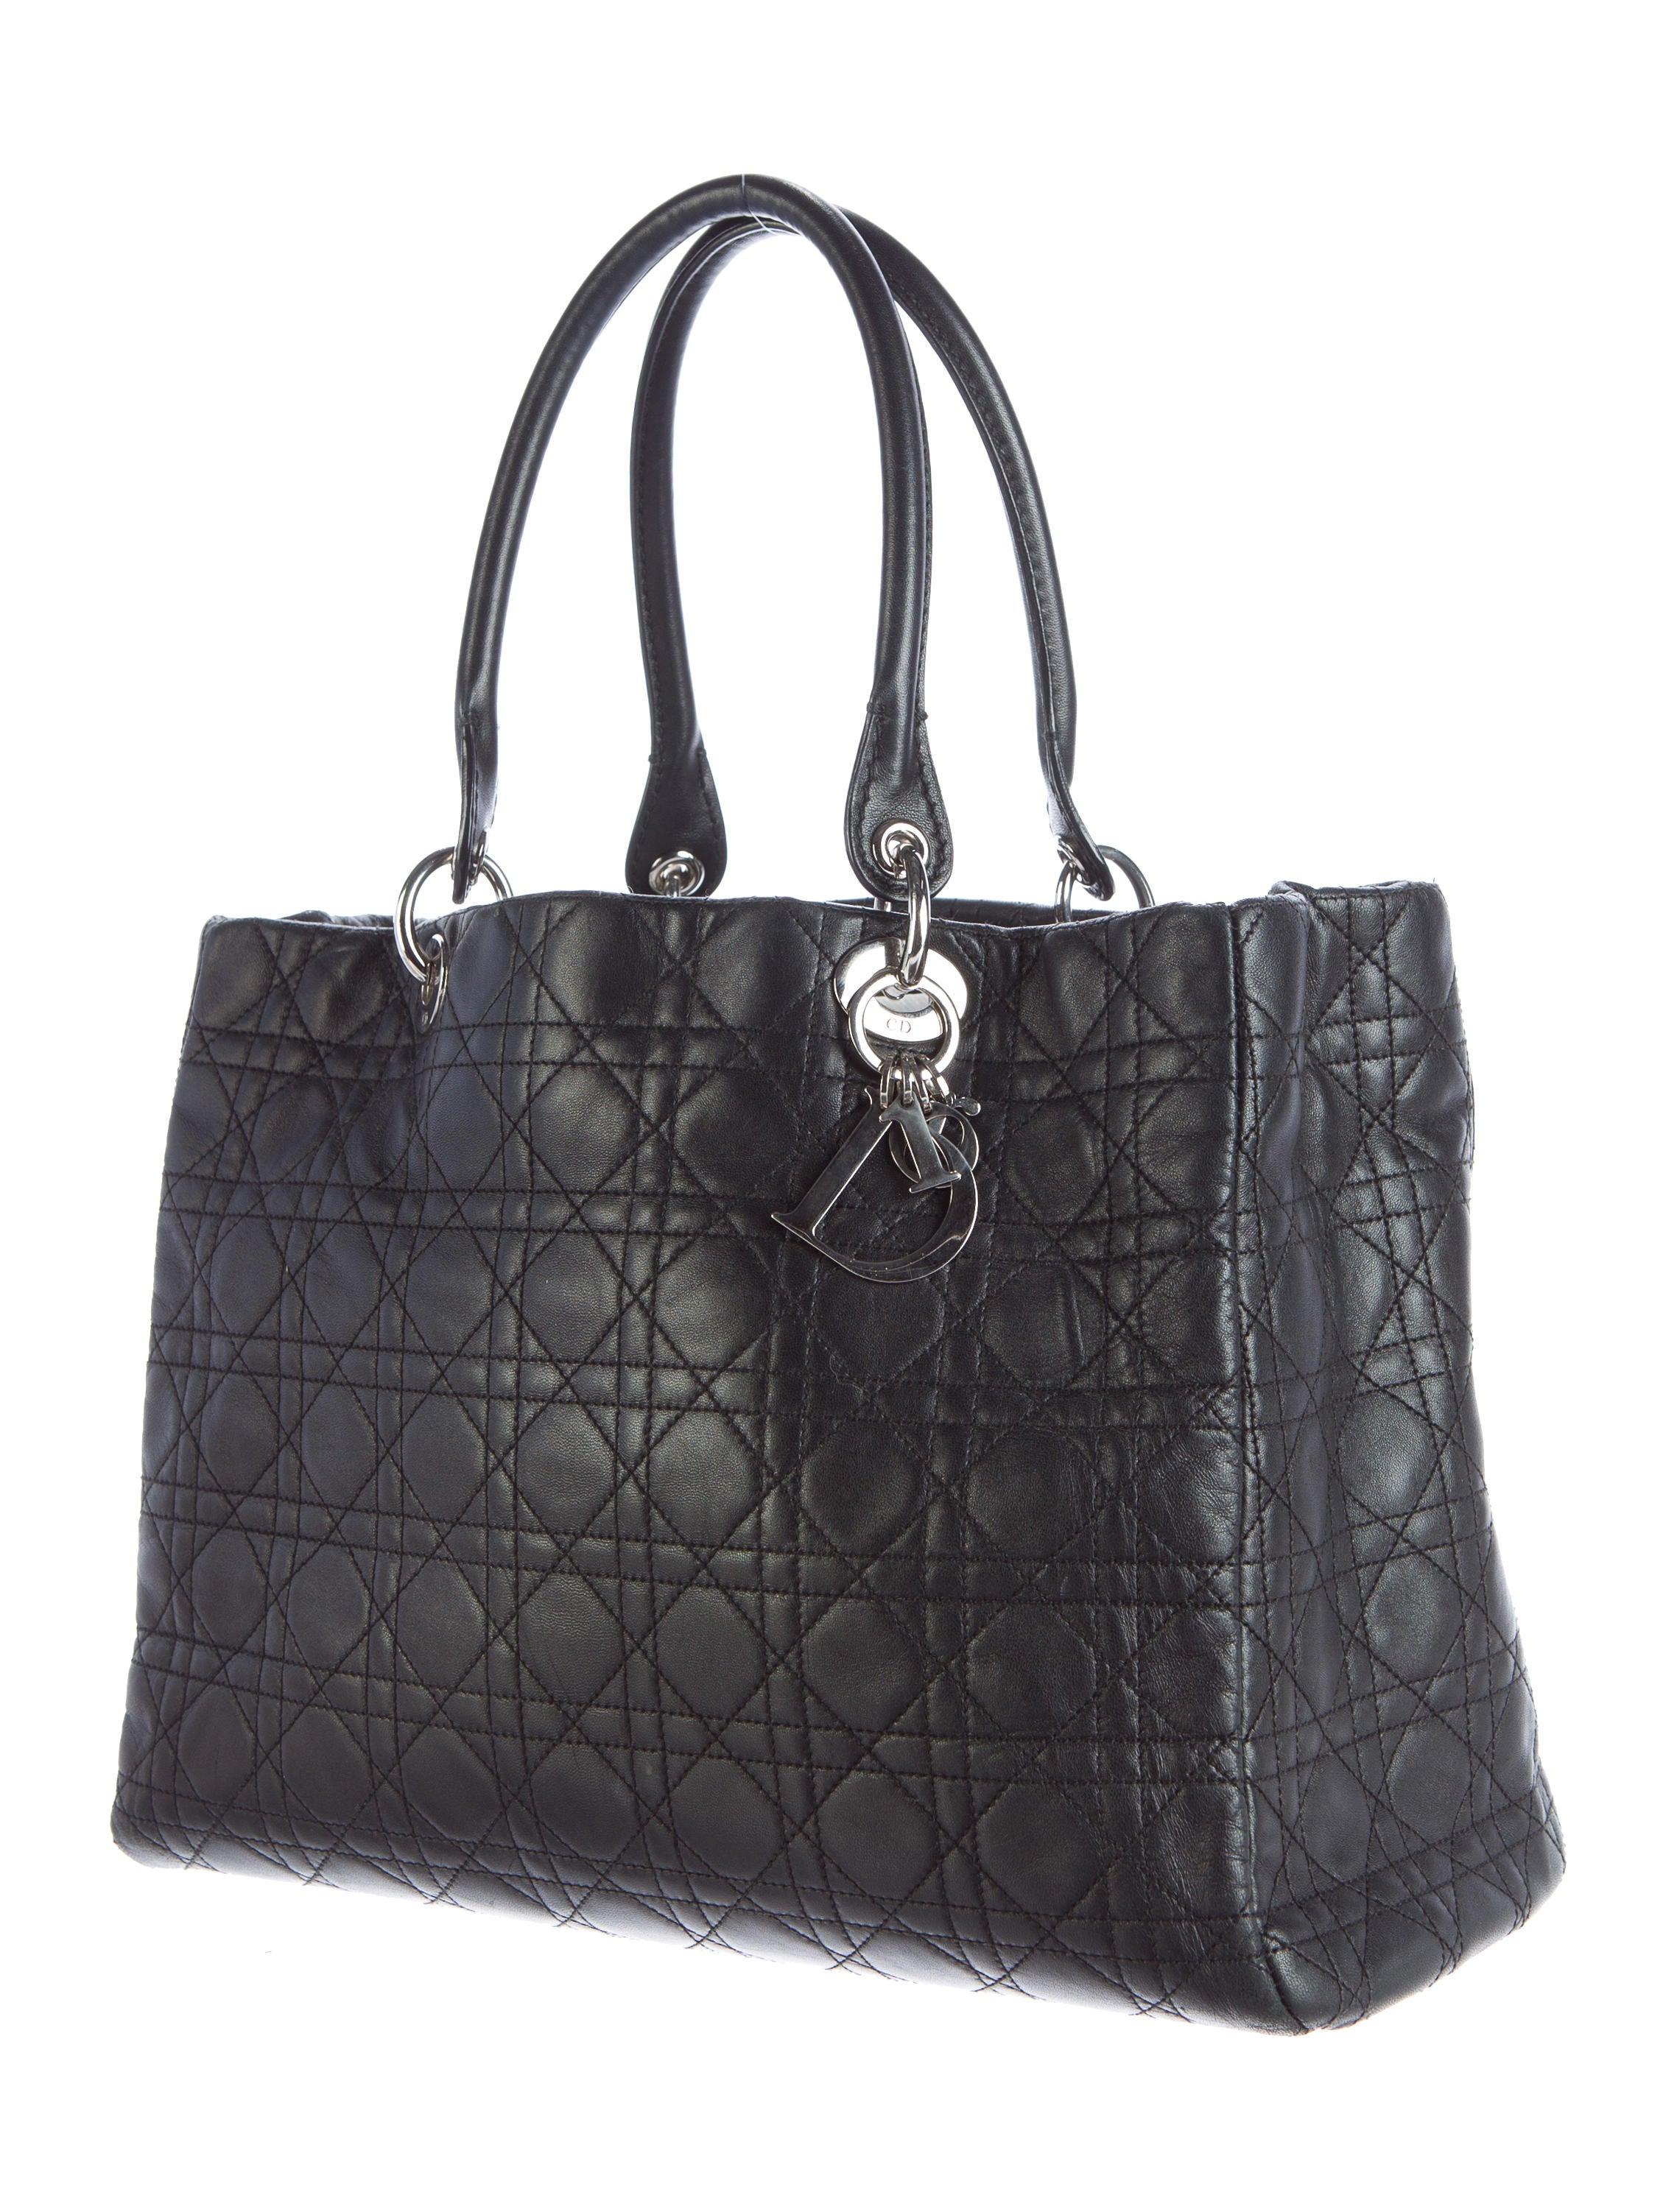 Christian Dior Soft Lady Dior Bag - Handbags - CHR45695 ...